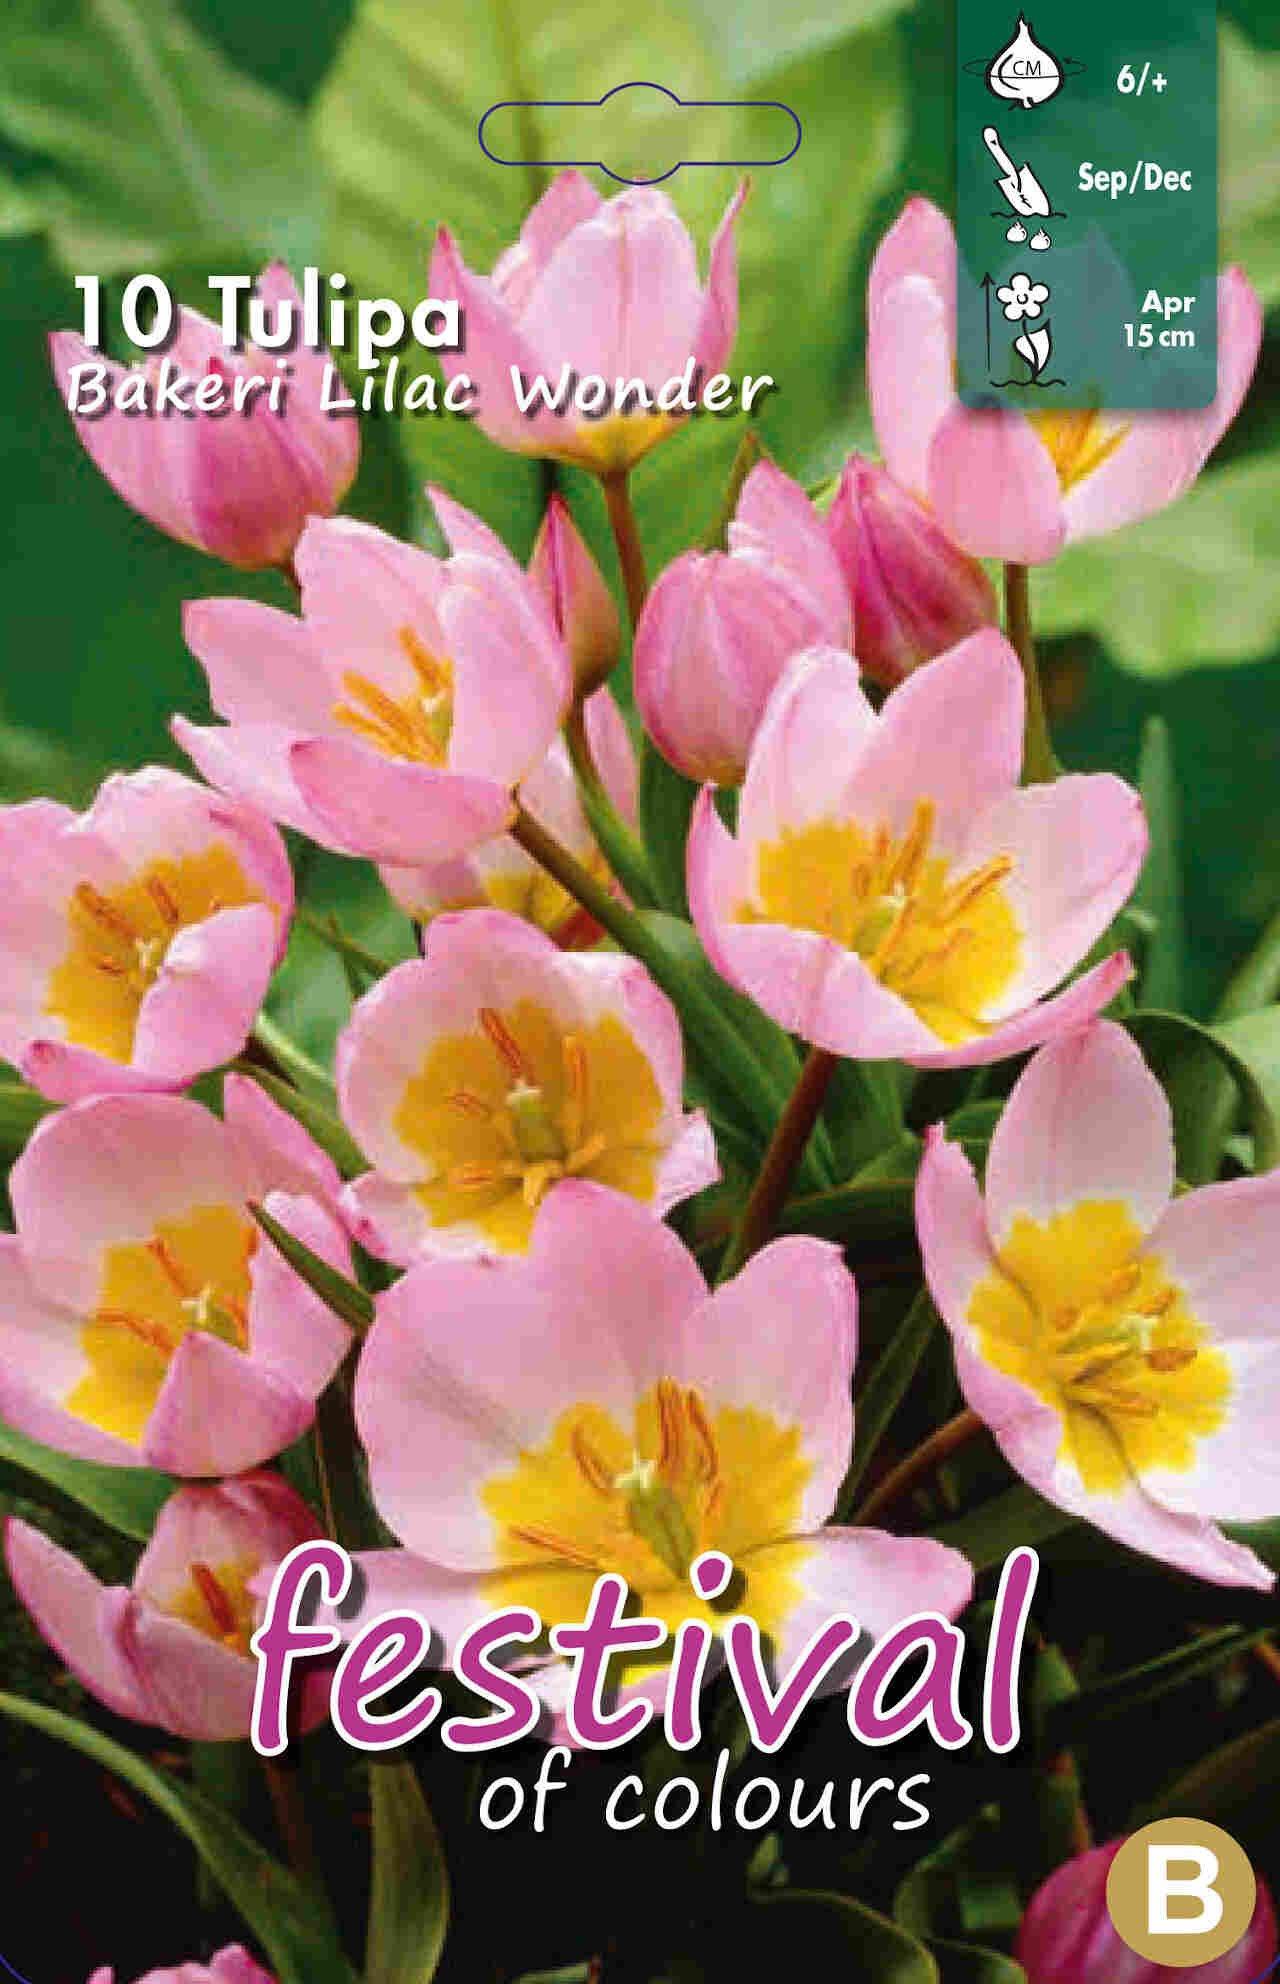 Tulipanløg - Tulipa Bakeri Lilac Wonder 6/+